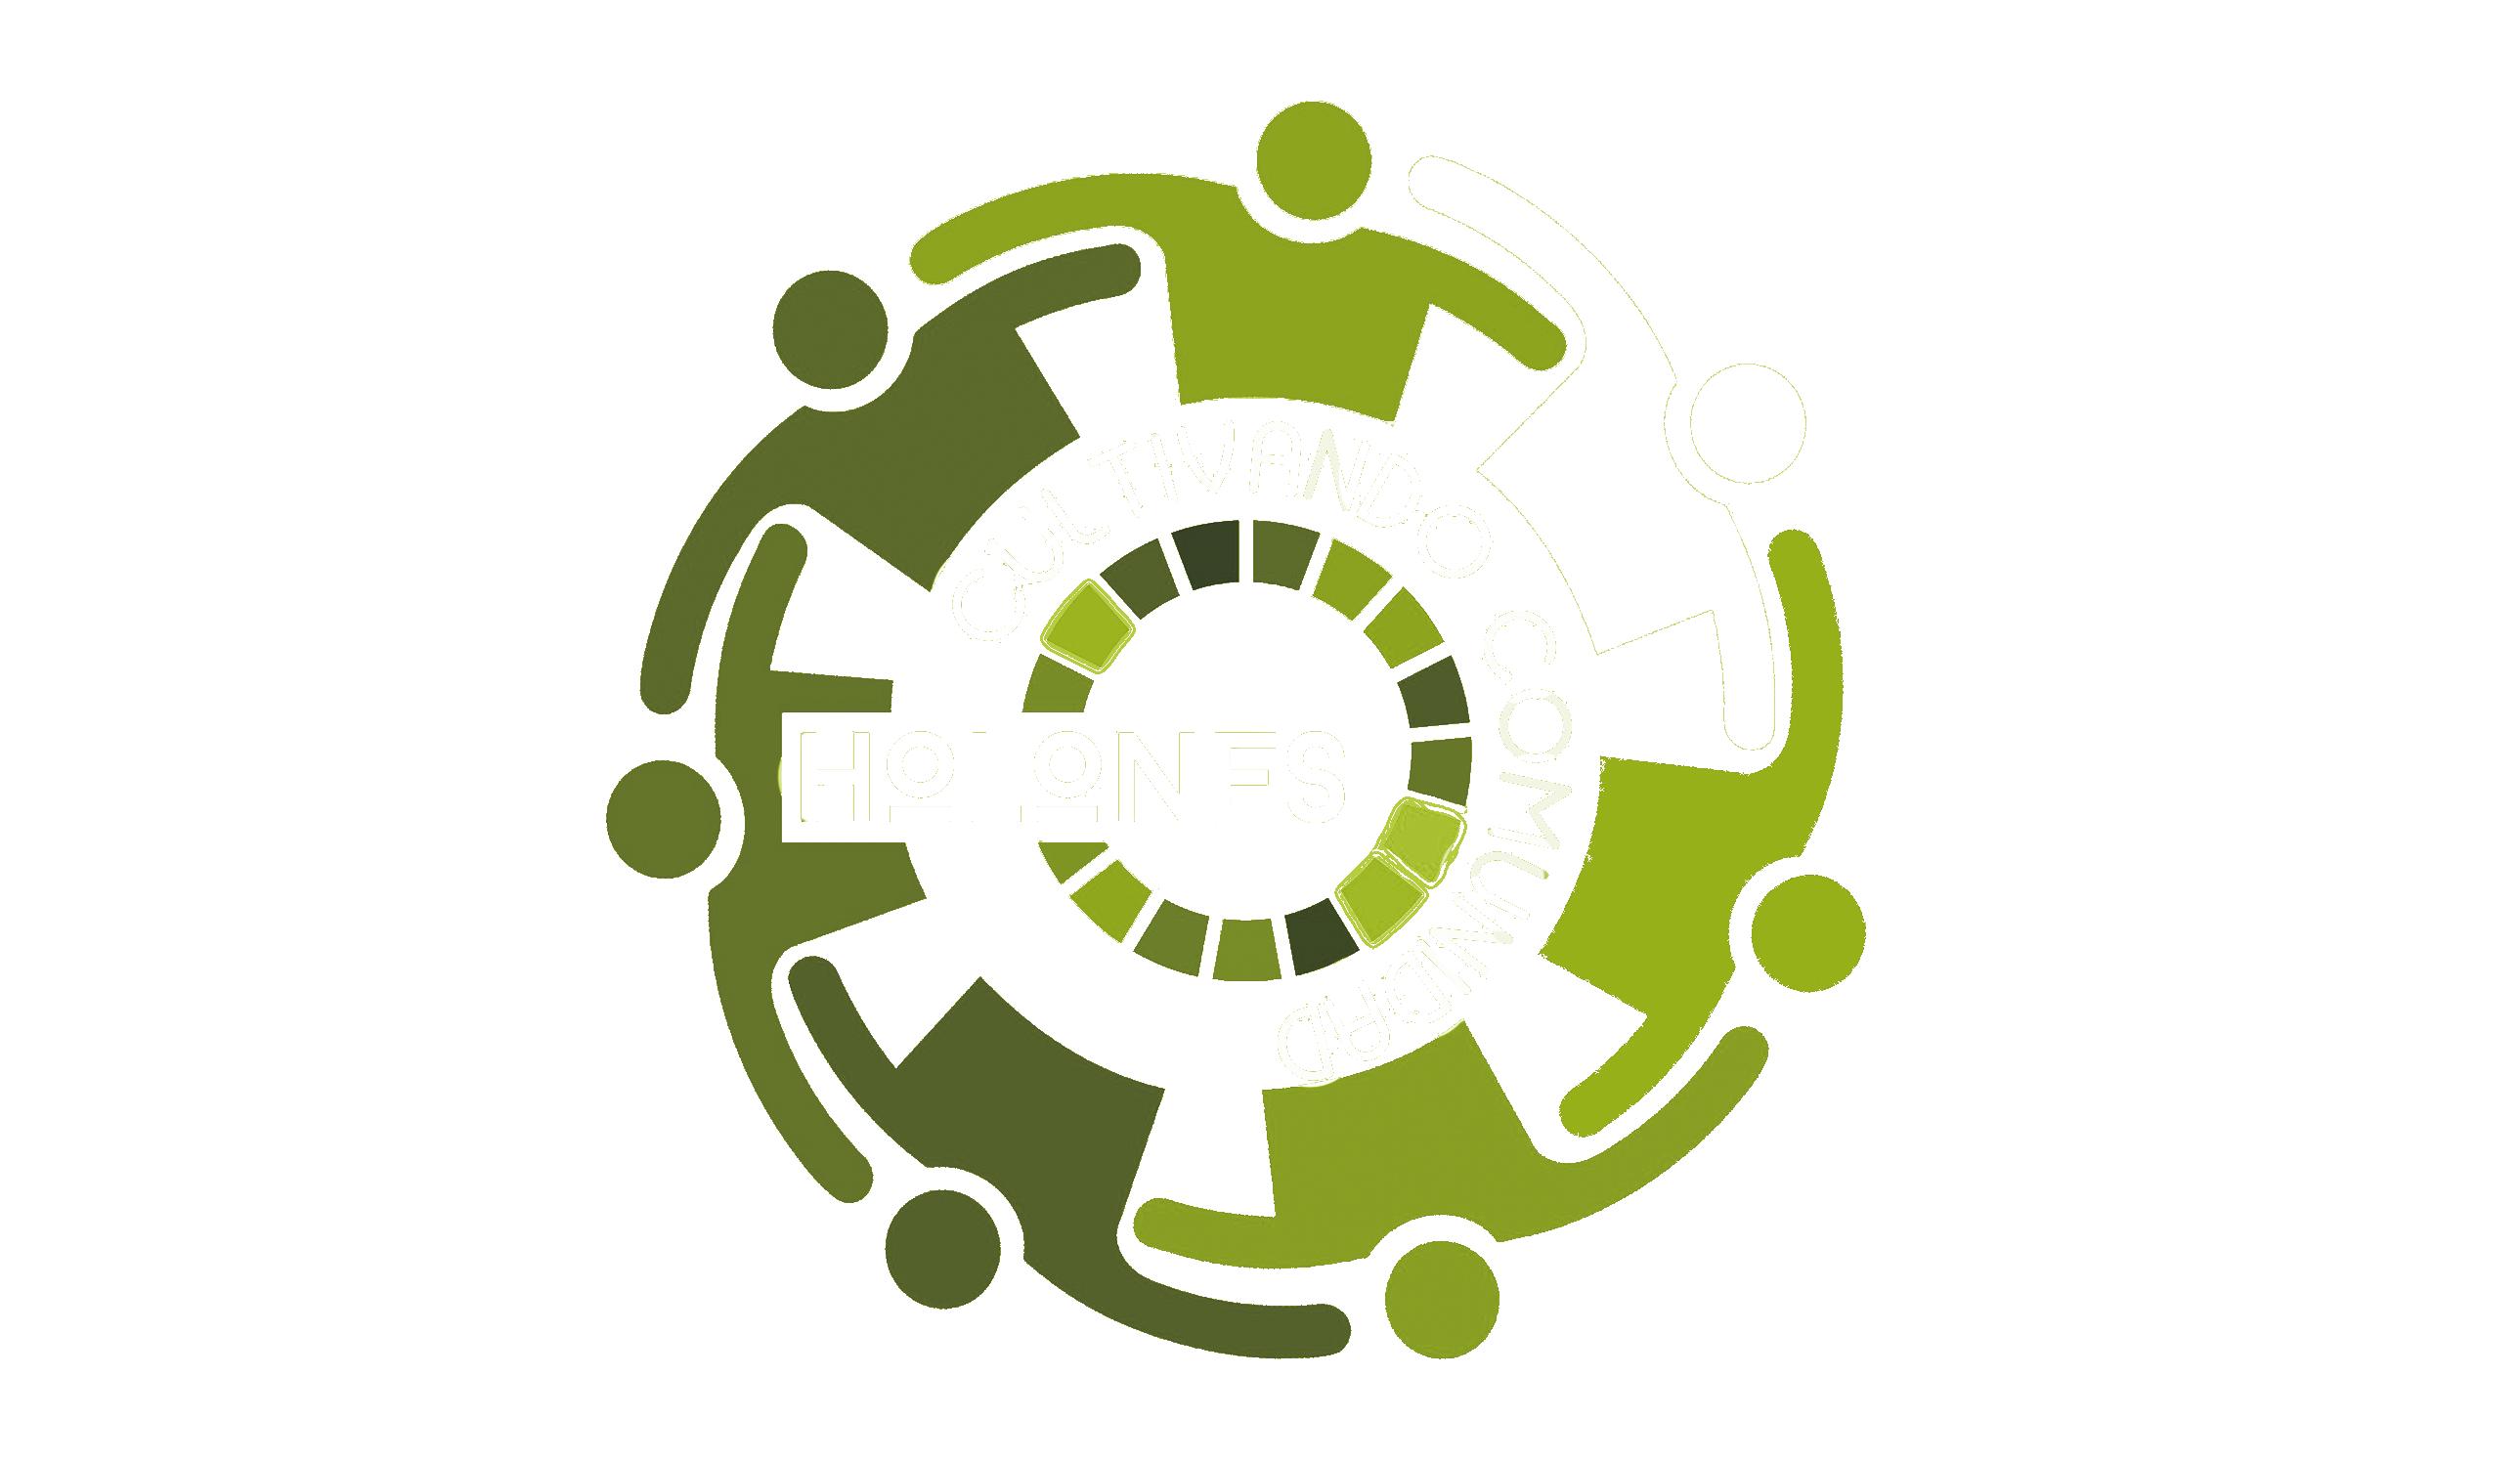 Logo Holones